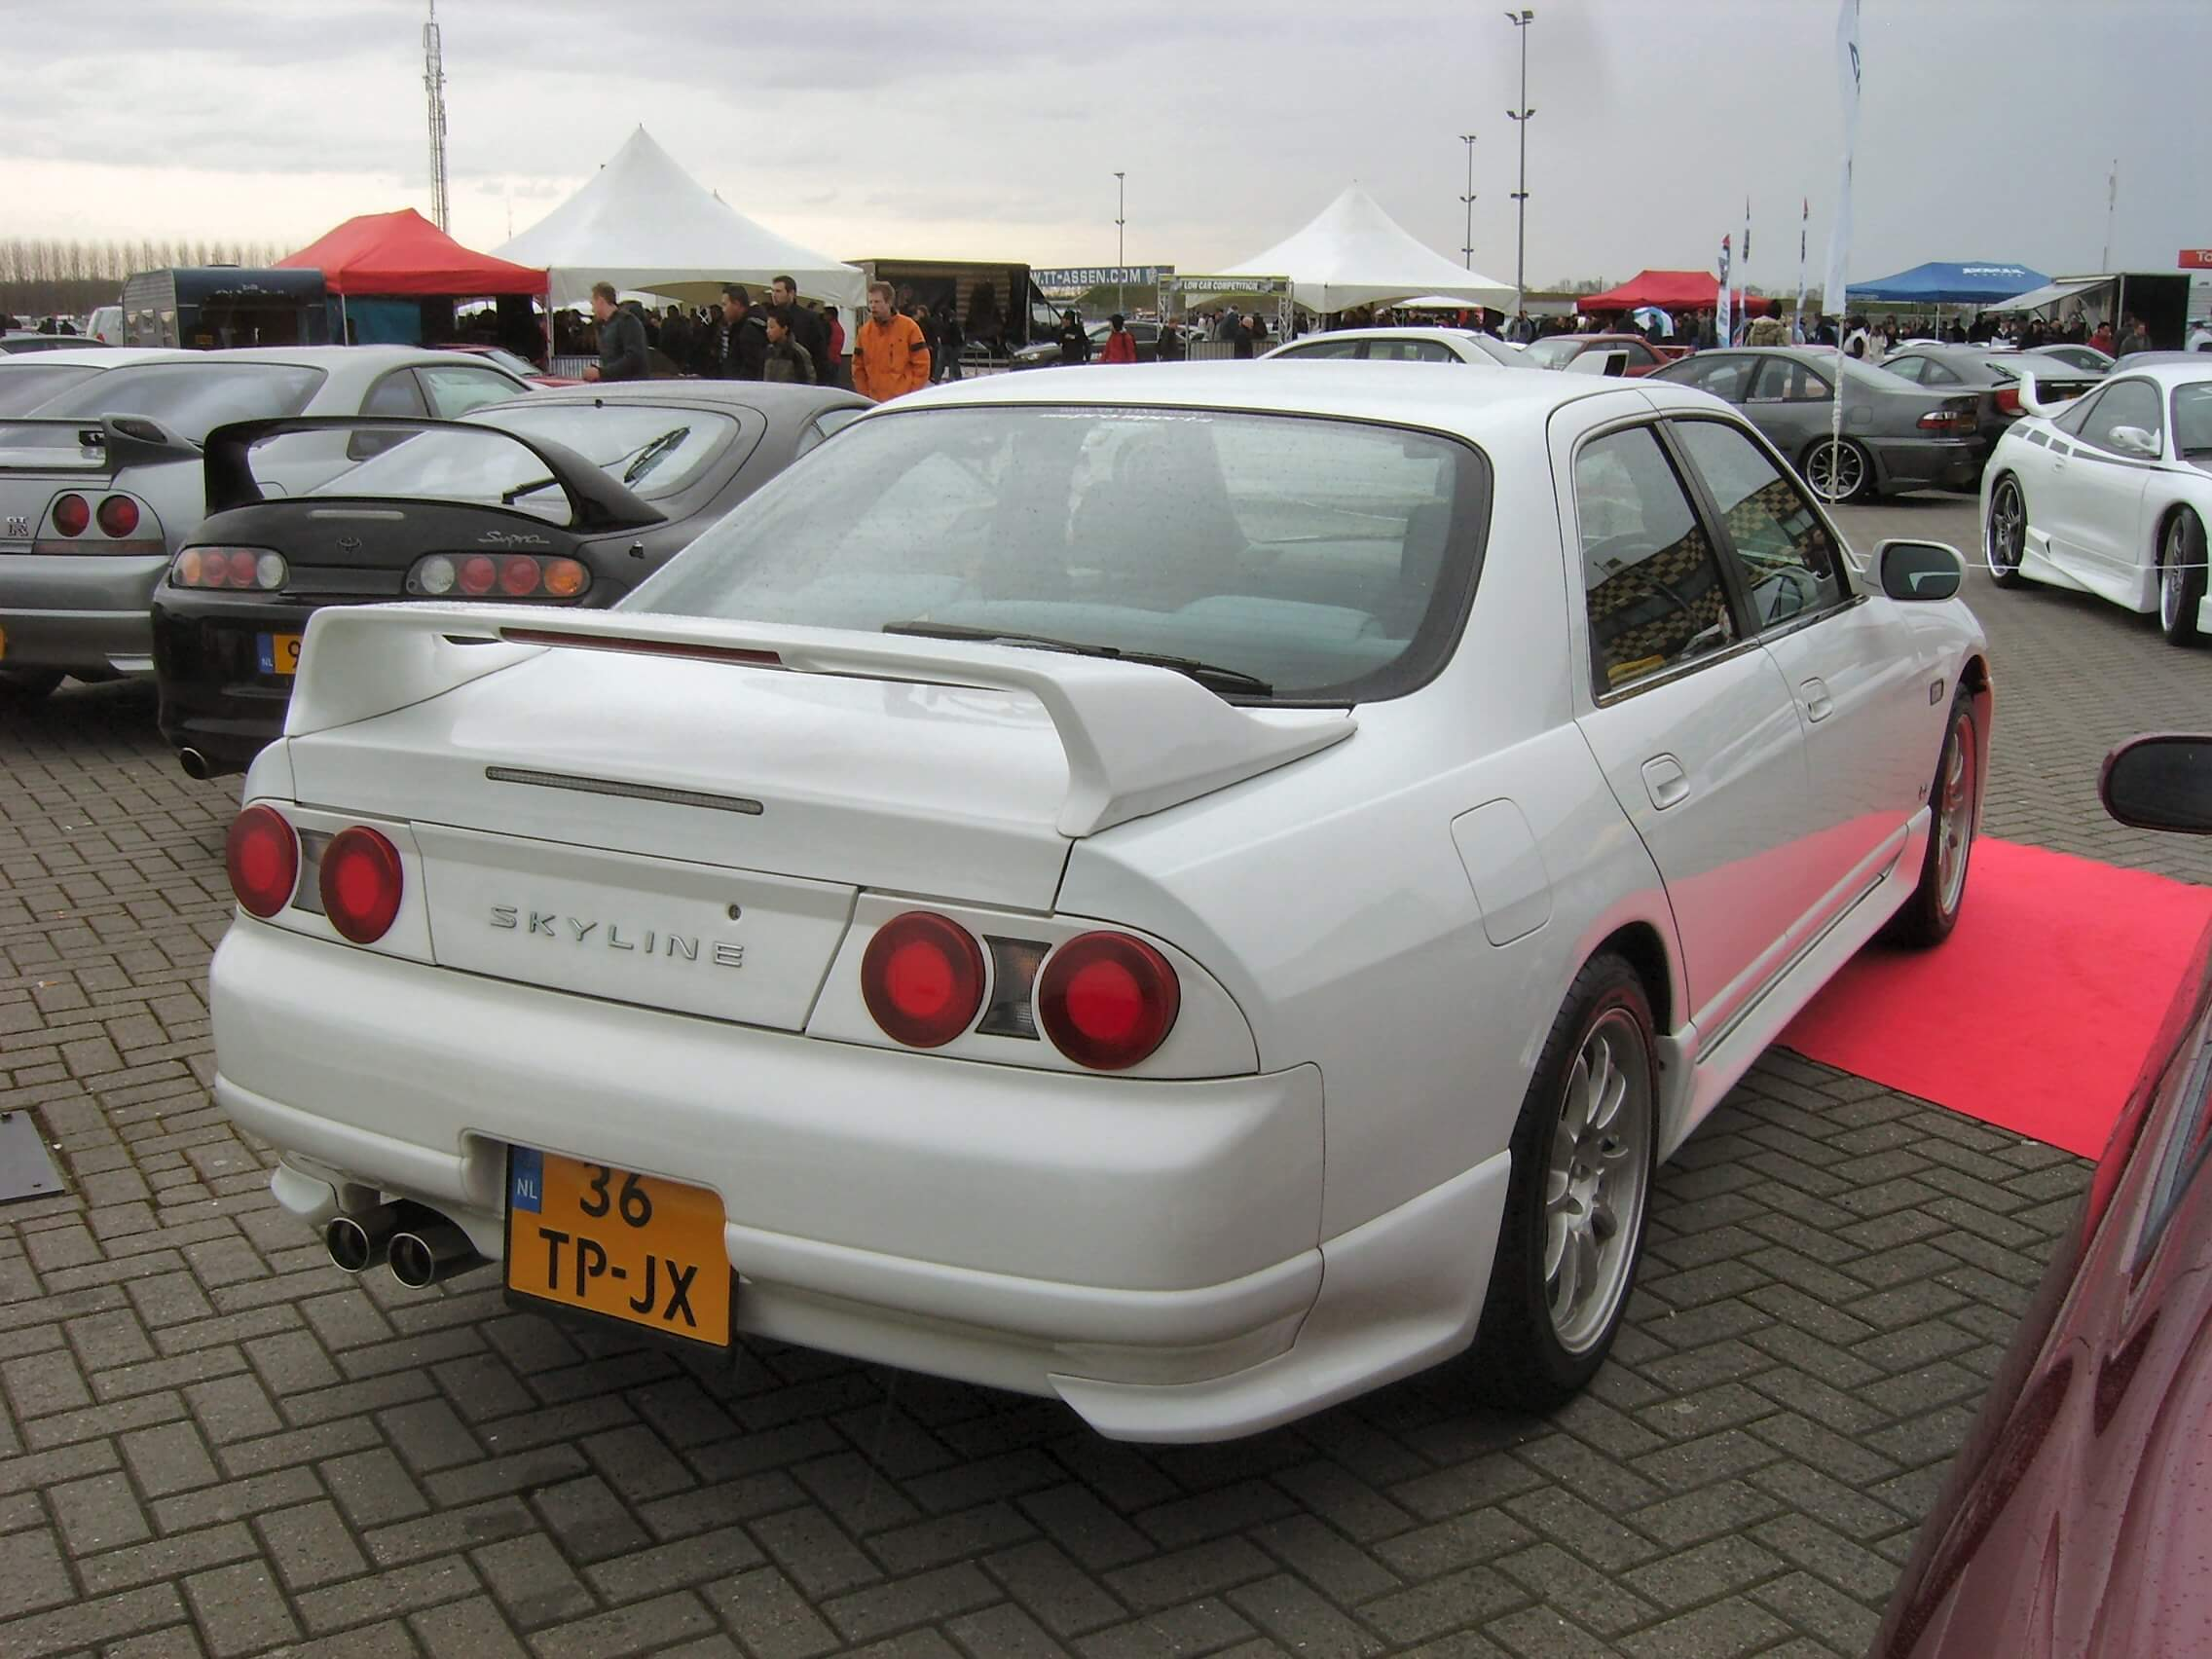 36-TP-JX: NISSAN SKYLINE GTS-4 uit 1995